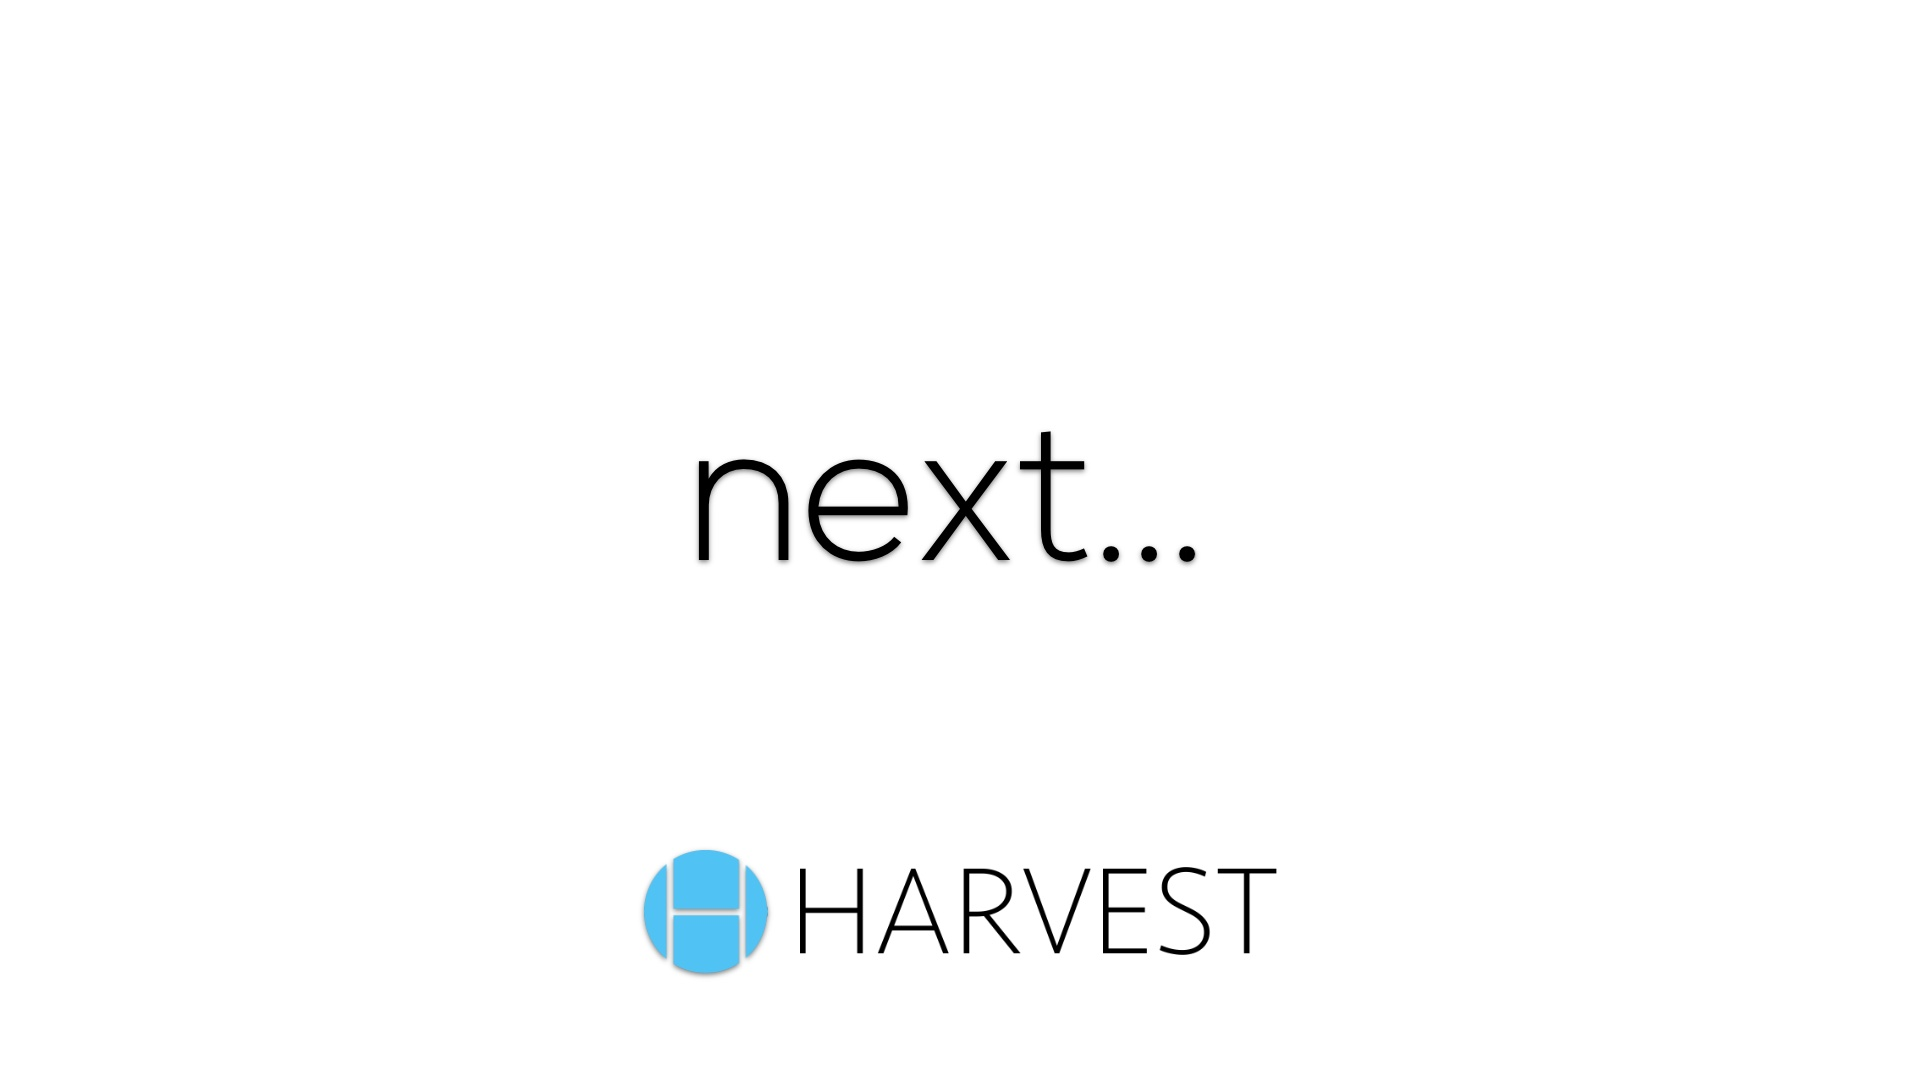 Harvest Next…